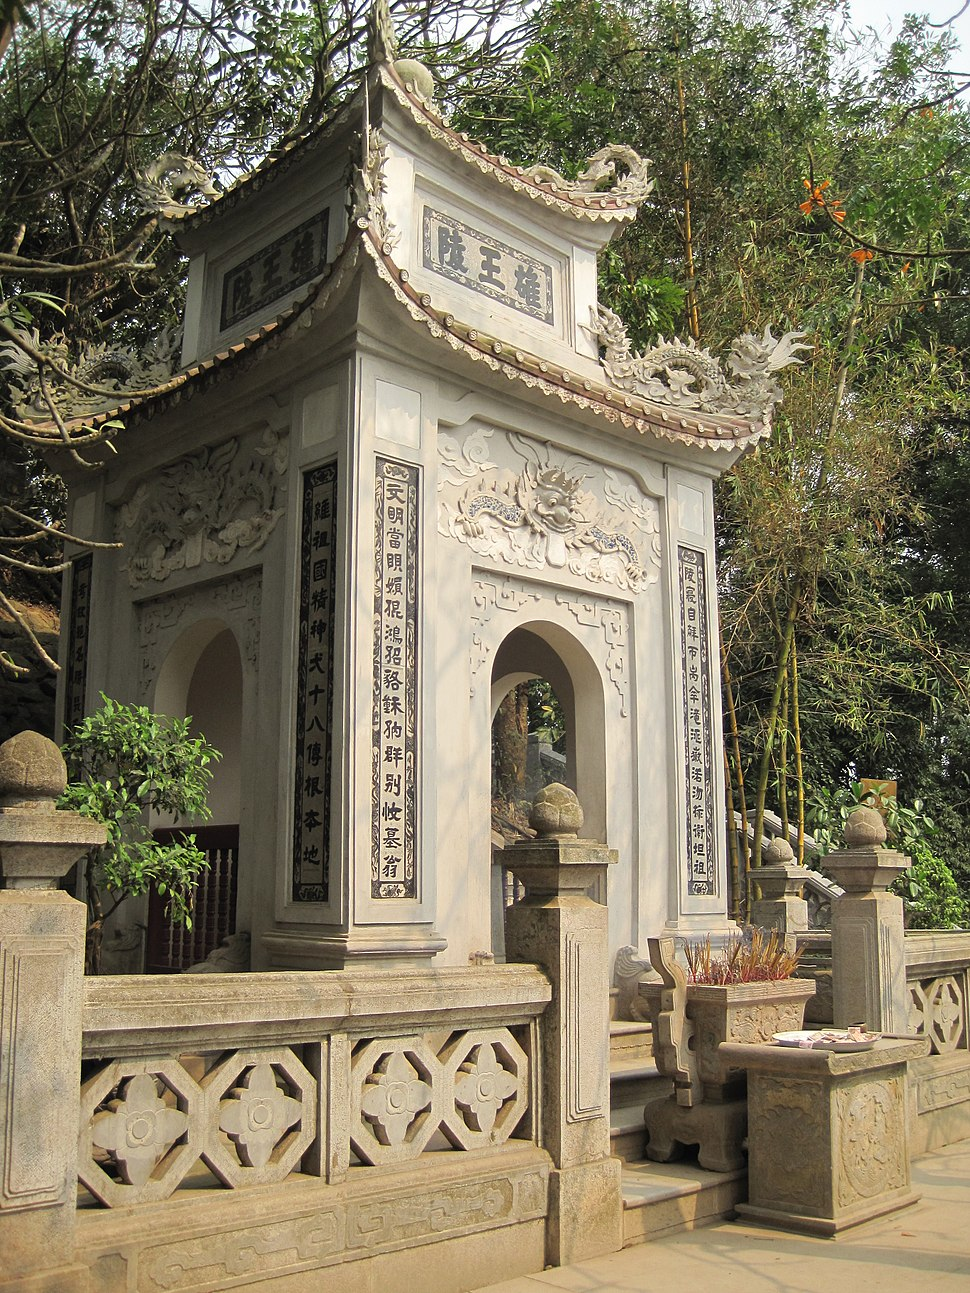 Mausoleum of Hung King